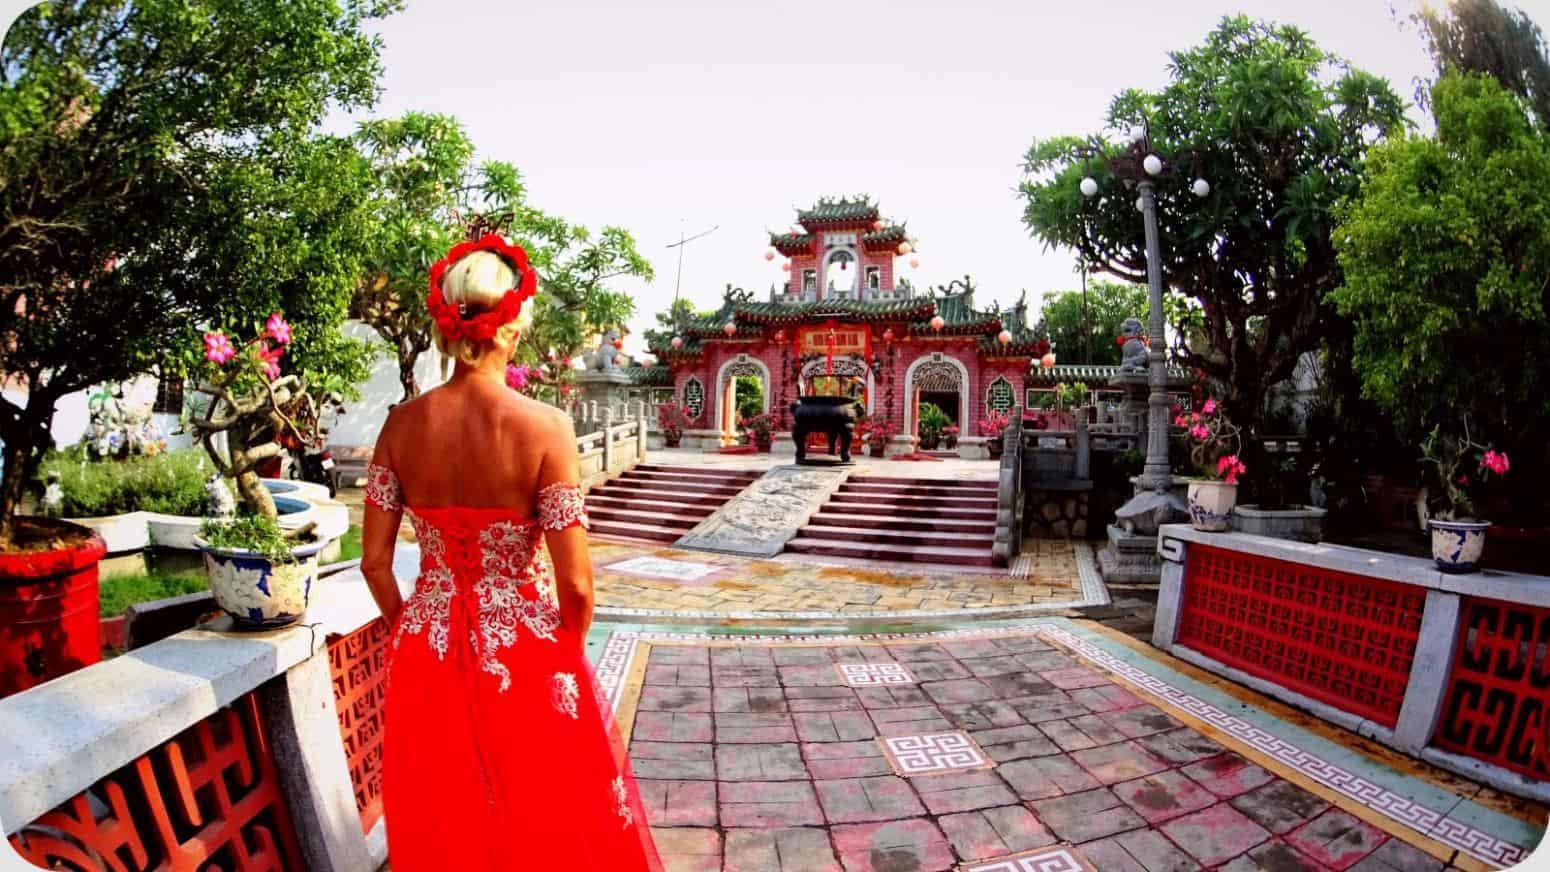 The traveling bride - cesta kolem sveta jinak